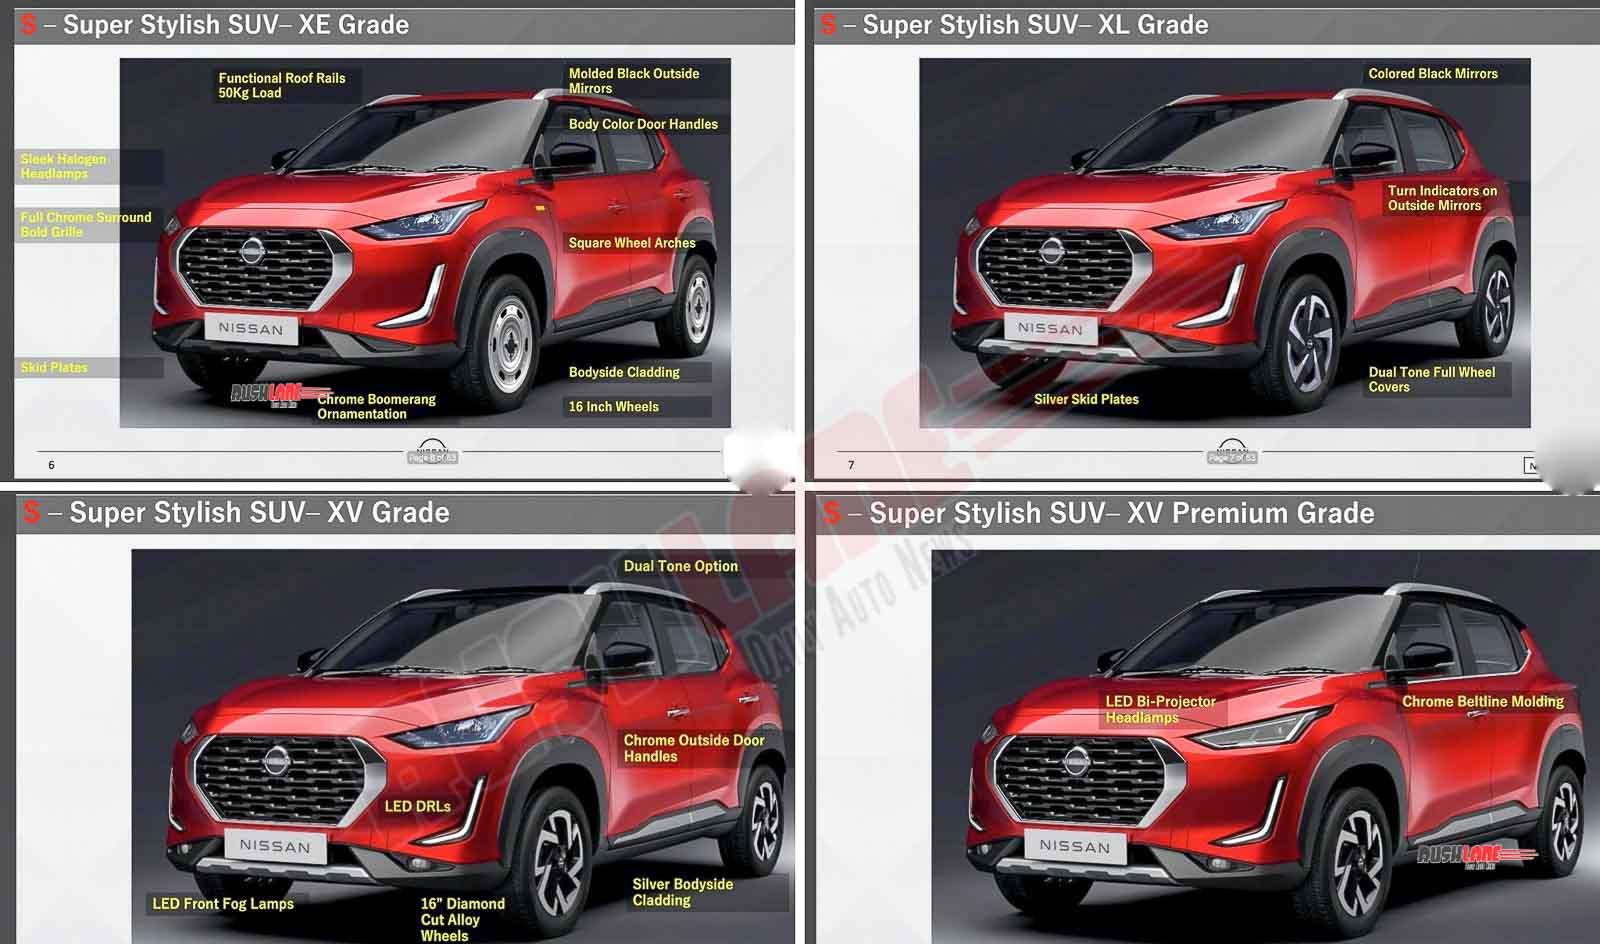 Nissan Magnite Variants Visually Compared